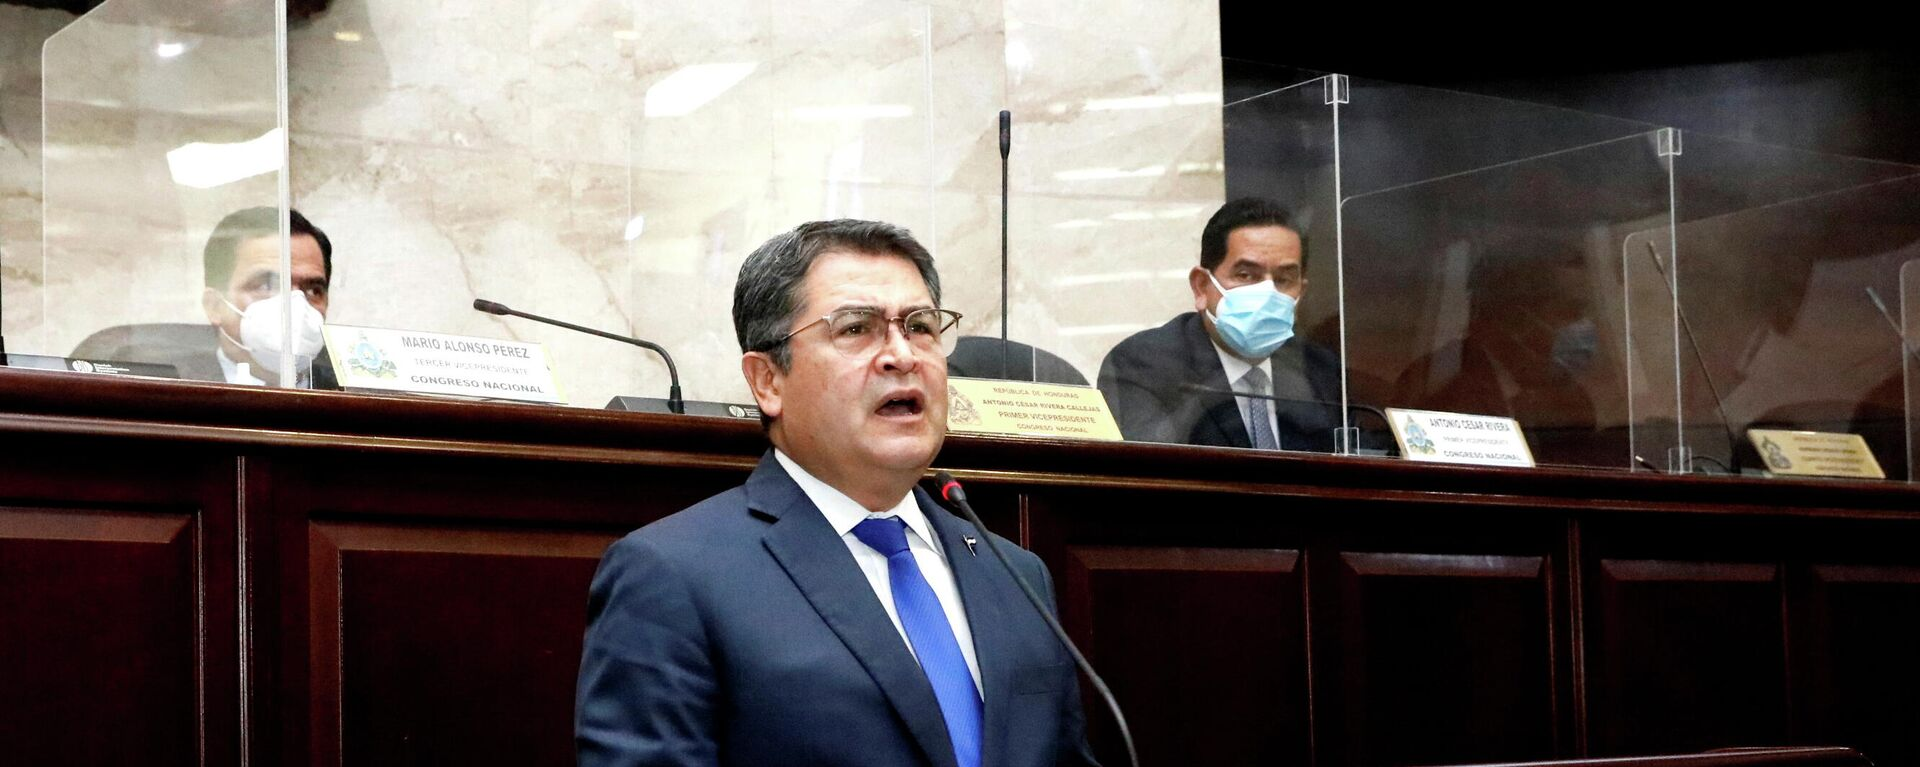 Juan Orlando Hernández, presidente de Honduras - Sputnik Mundo, 1920, 19.03.2021